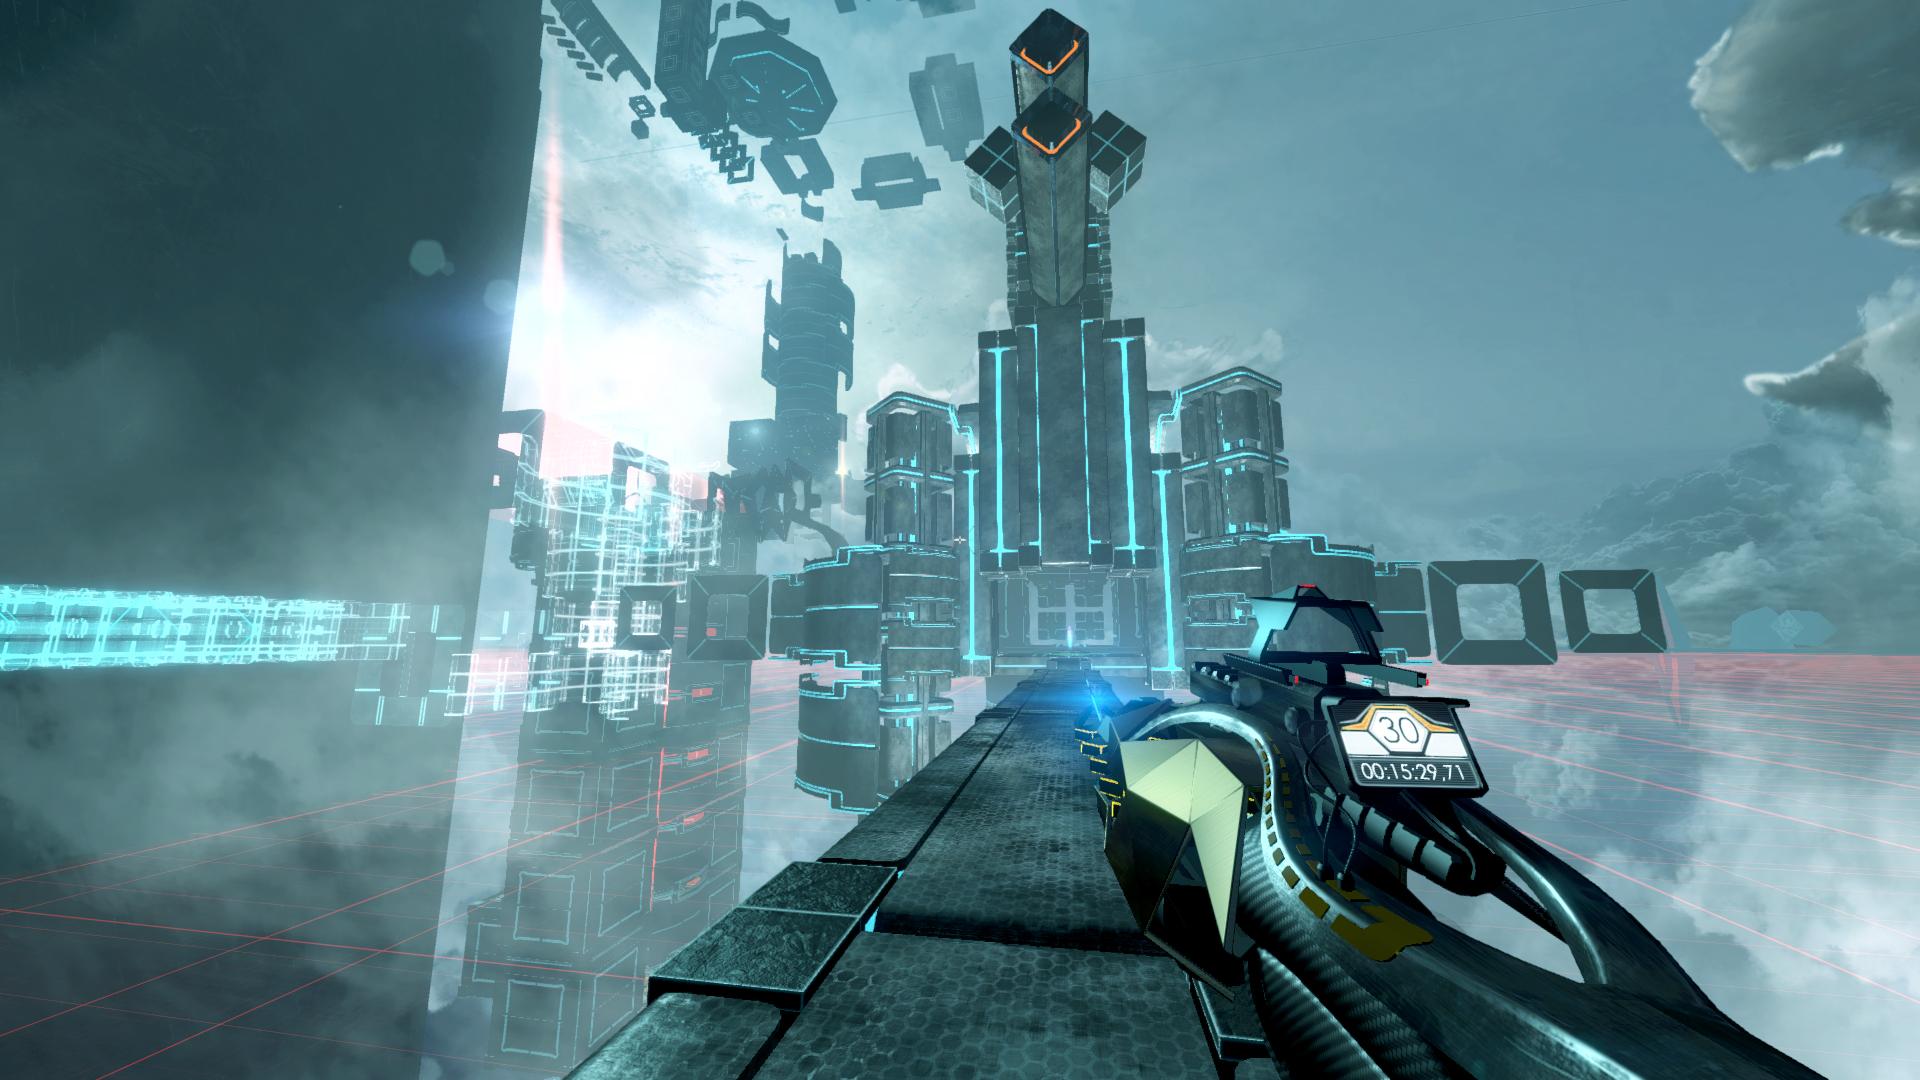 Deadcore storm Gameplay 1